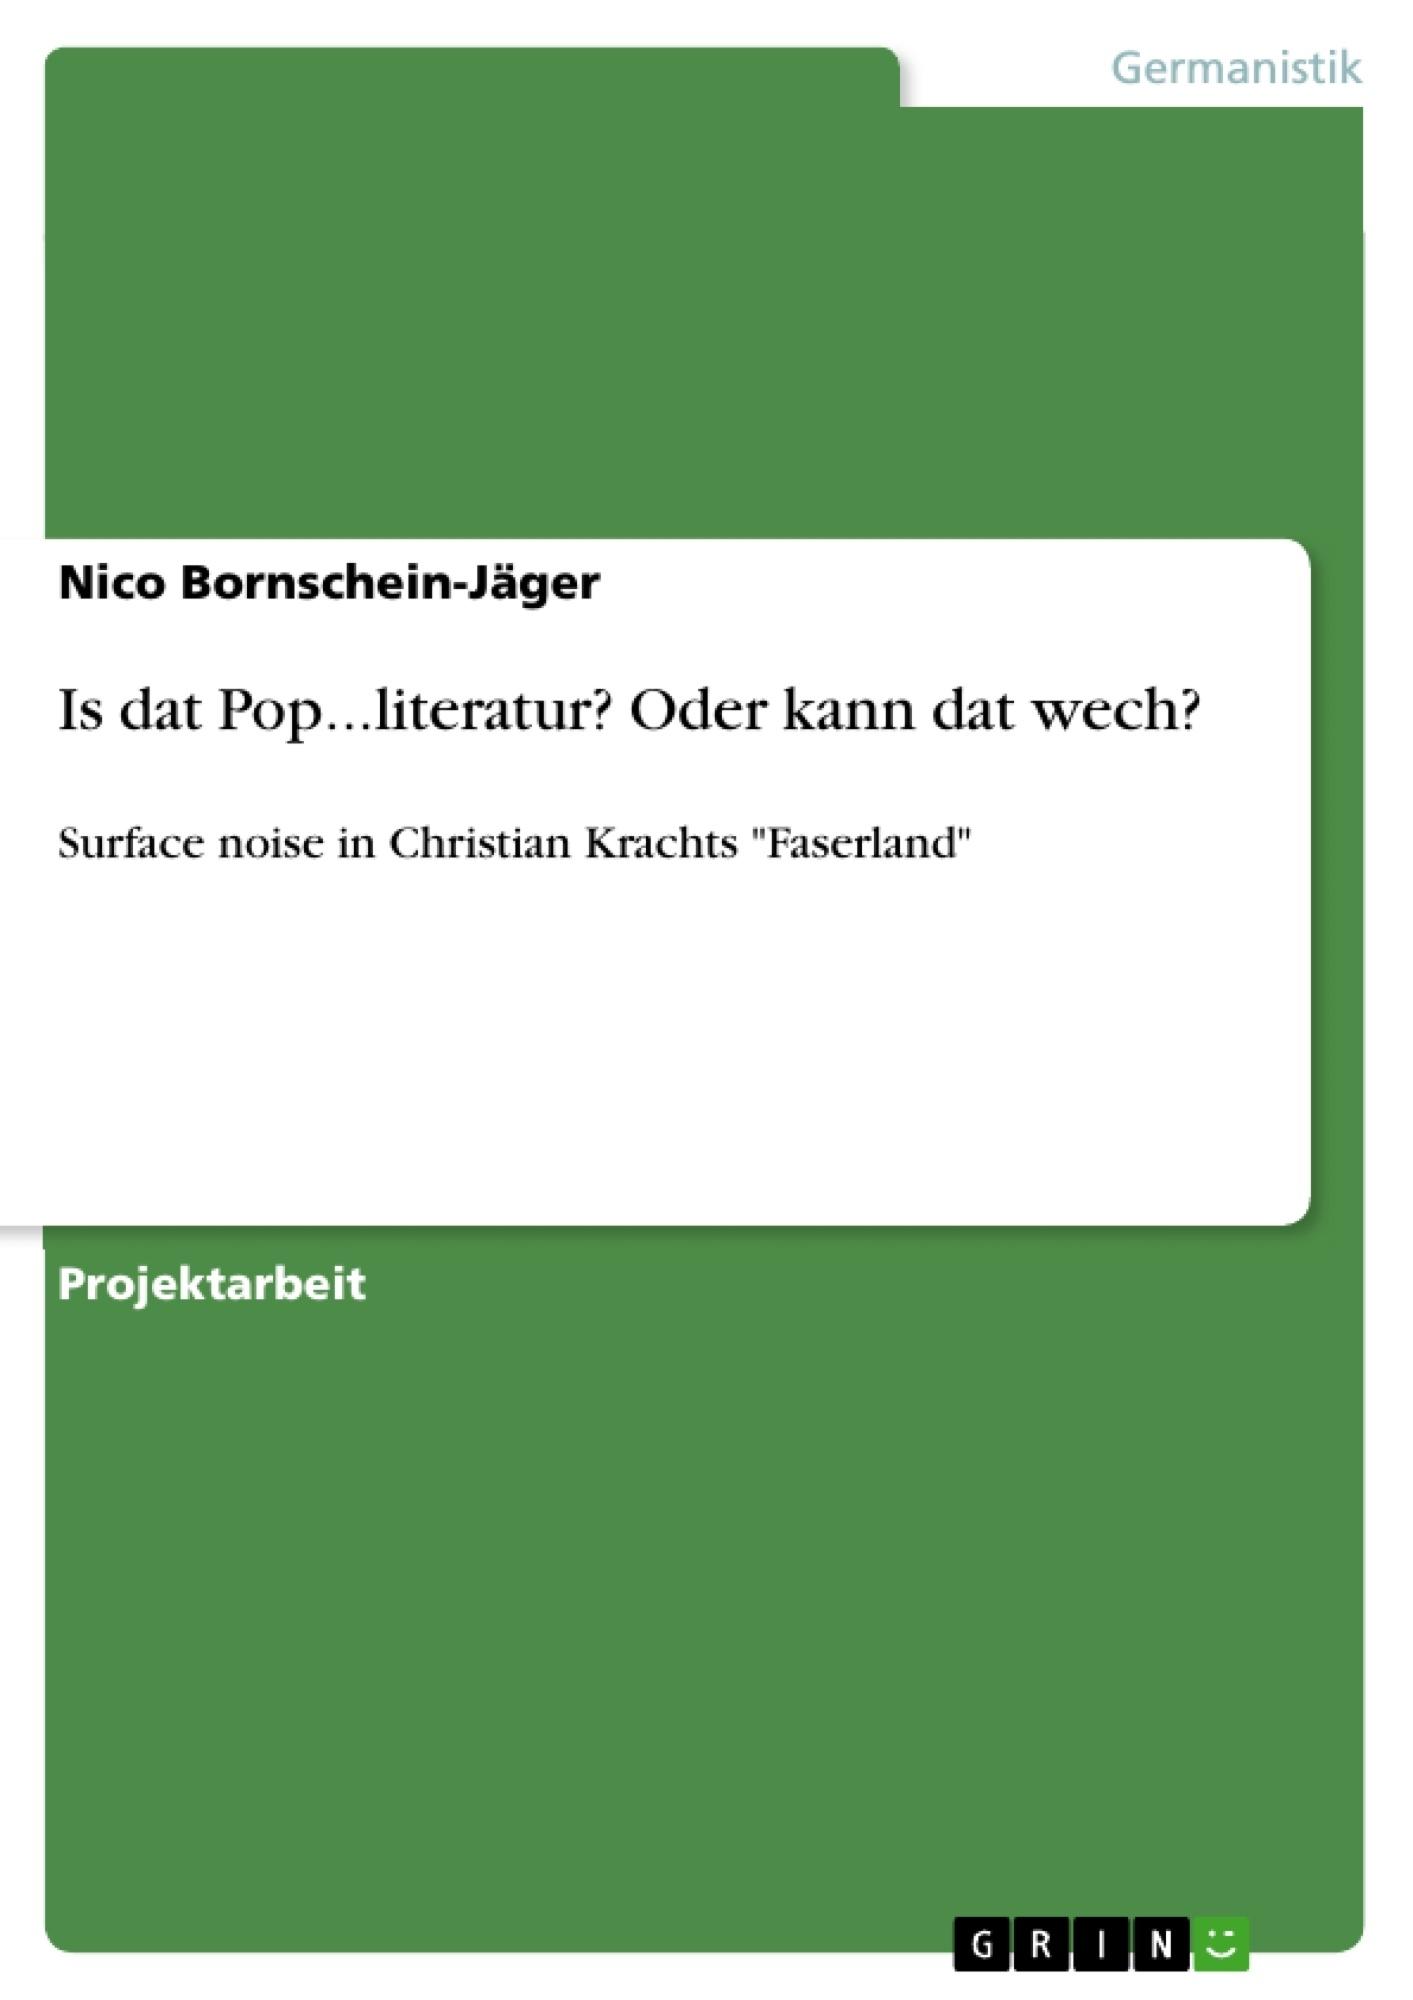 Titel: Is dat Pop...literatur? Oder kann dat wech?